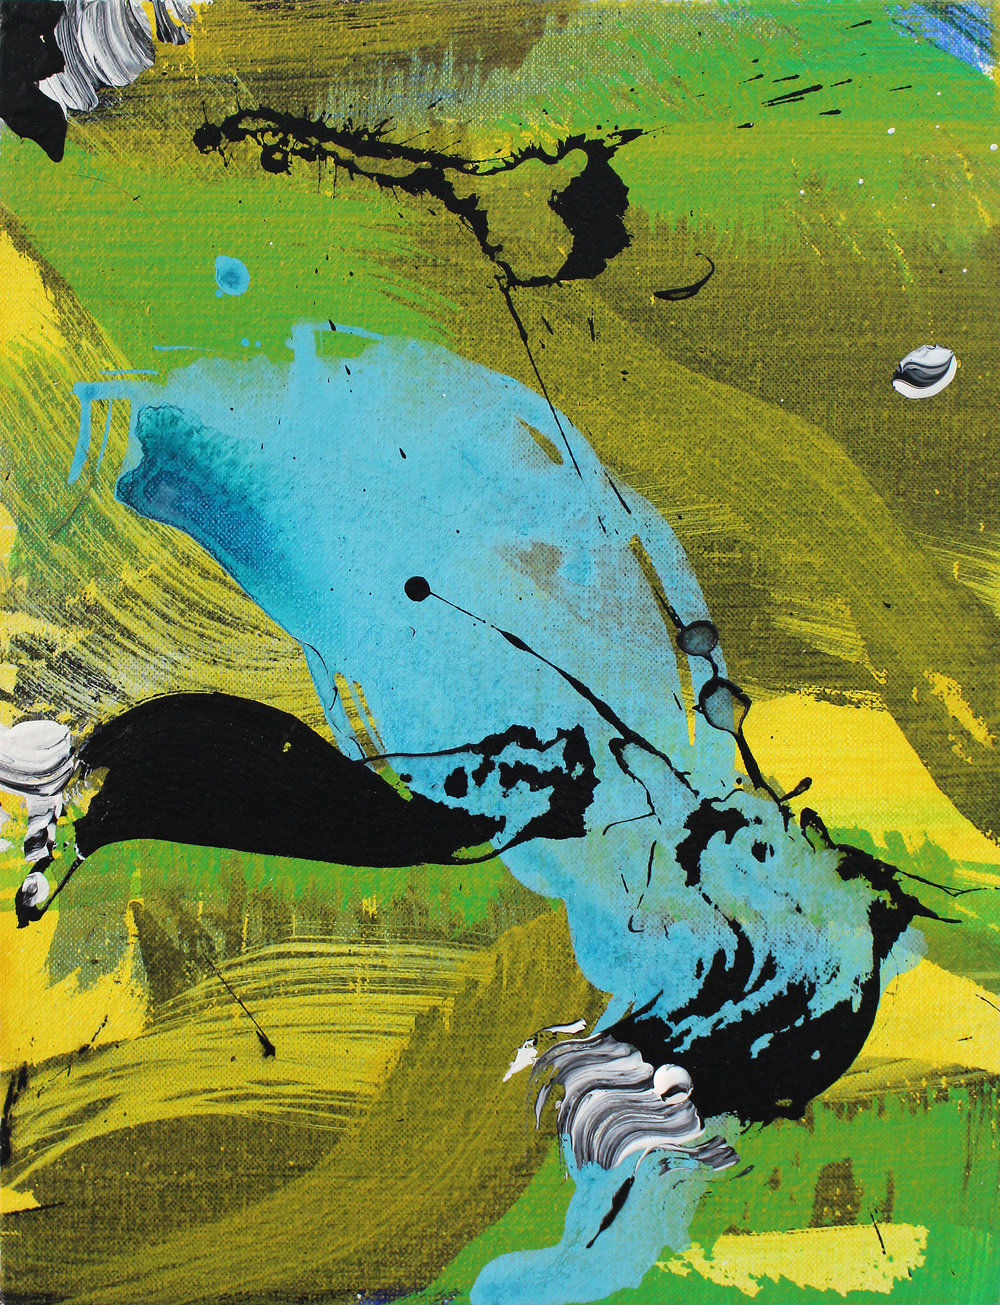 Juan Olivares-Untitled VIII-2014- 35 x 27 cm-Acrylic on canvas.jpg